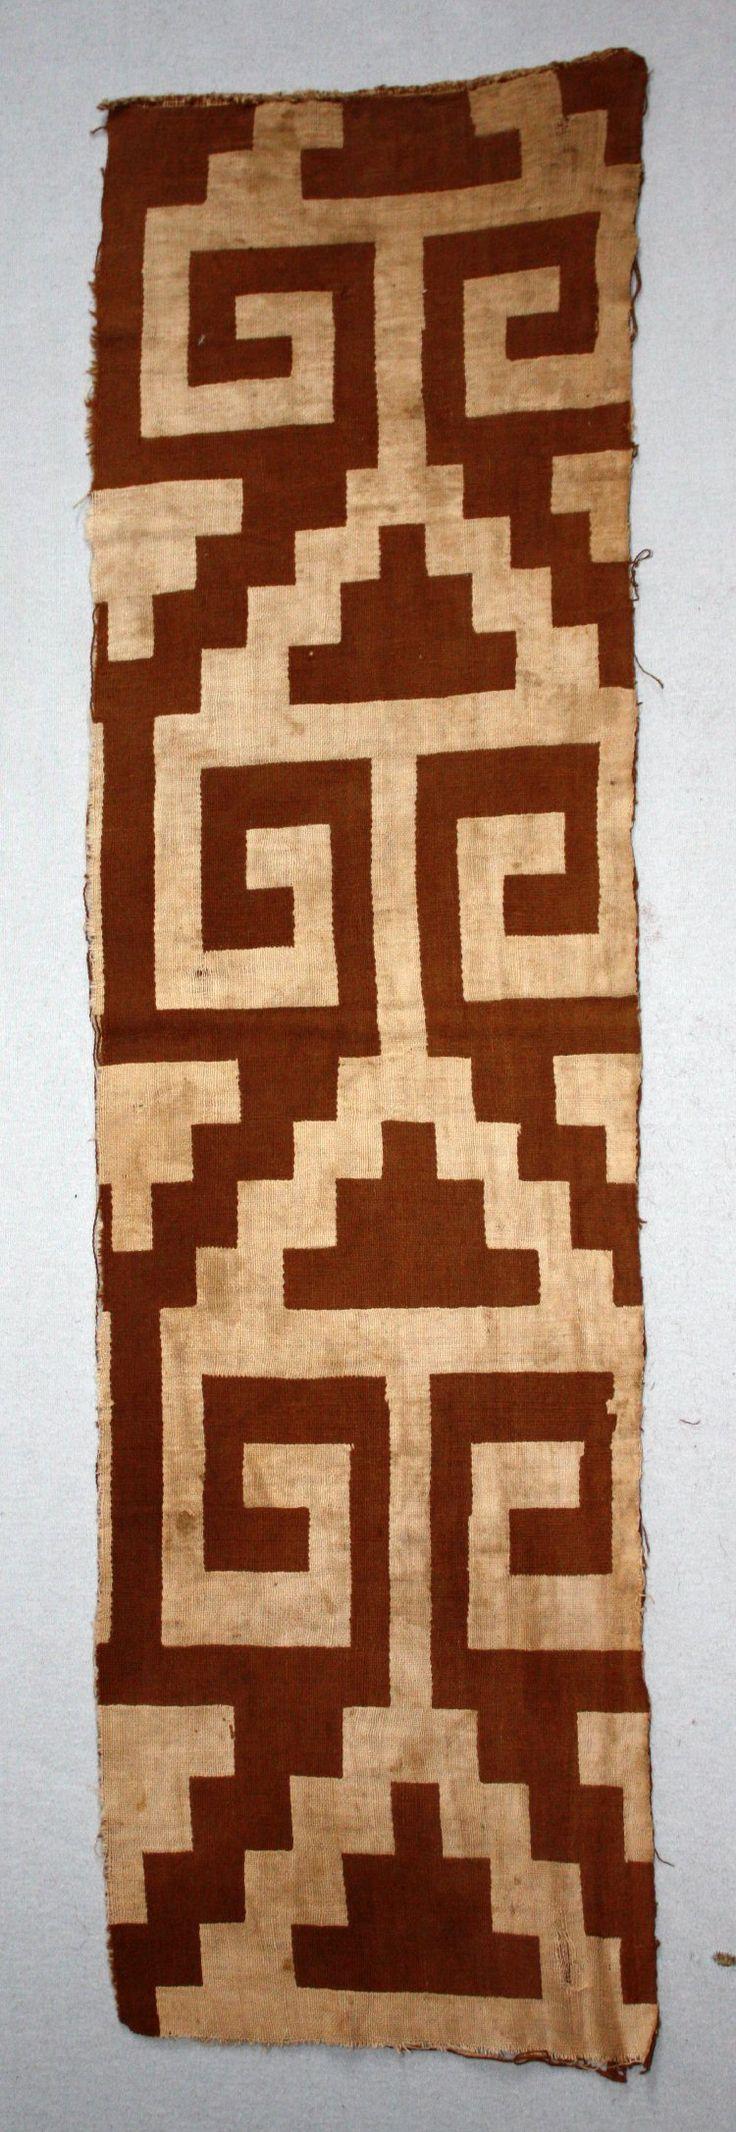 Textile fragment; cotton; Chimu culture, Peru. British Museum, Online Collection.